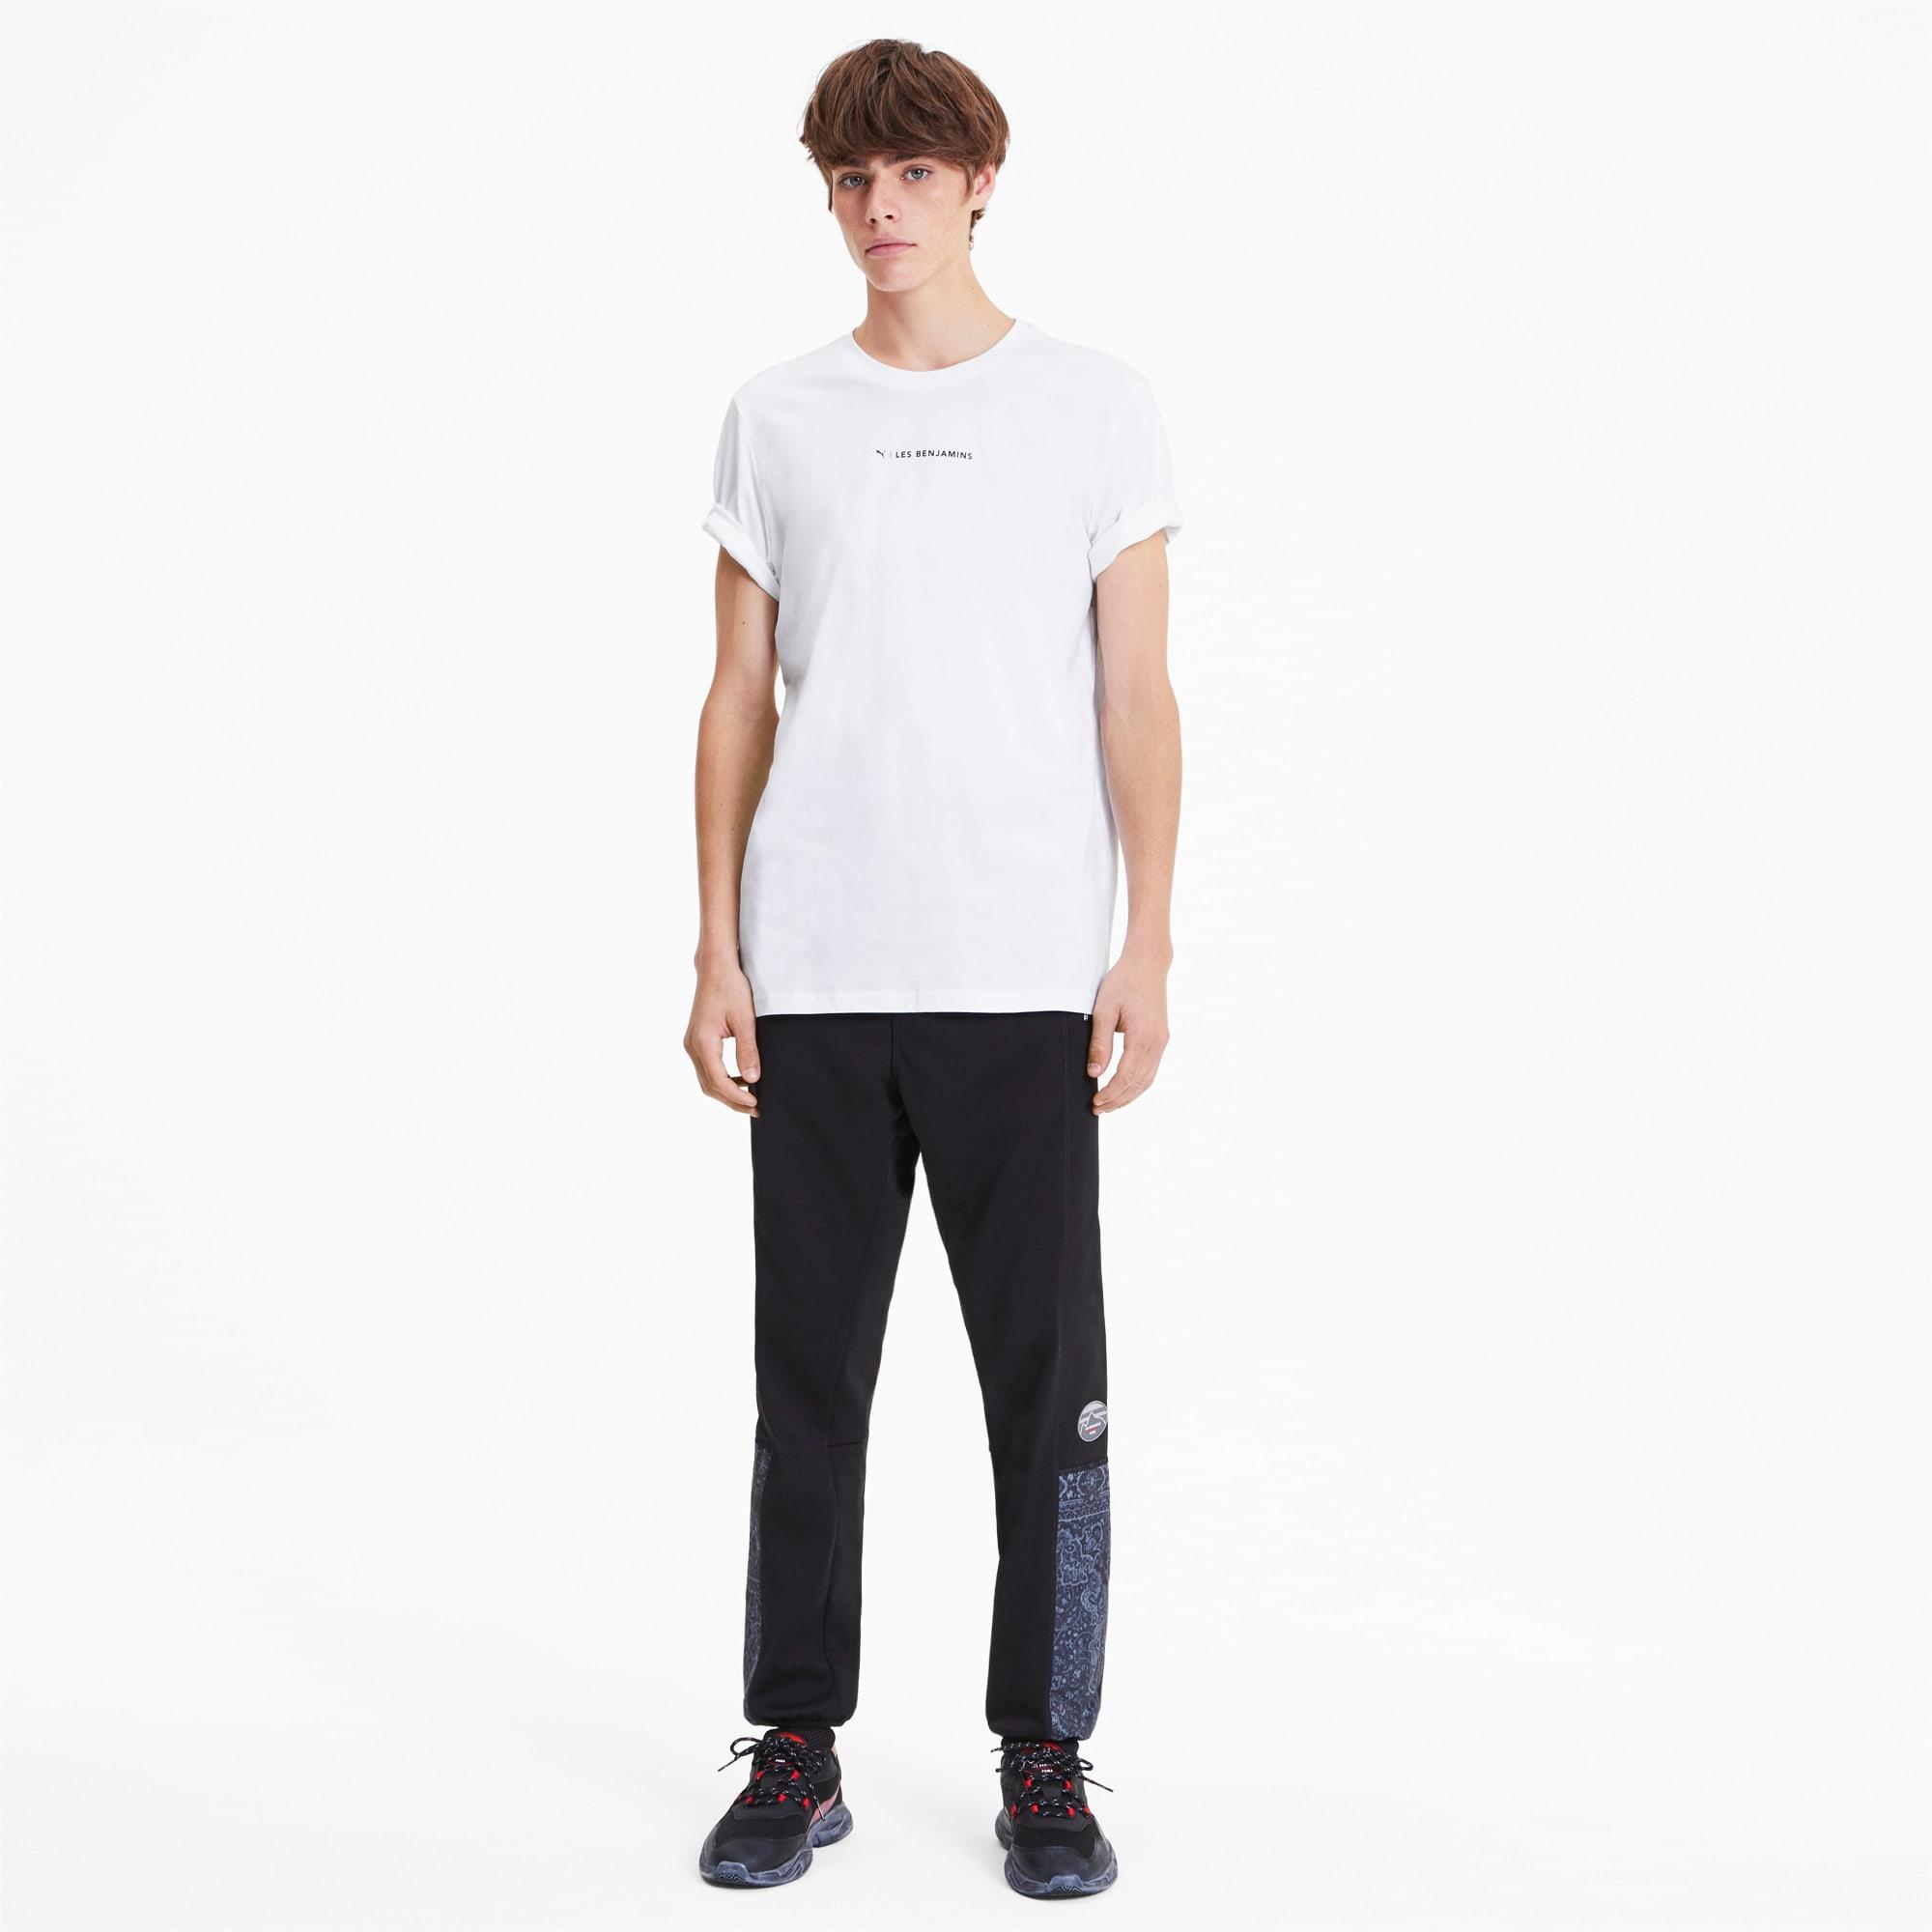 Thumbnail 3 of PUMA x LES BENJAMINS Tシャツ, Puma White, medium-JPN